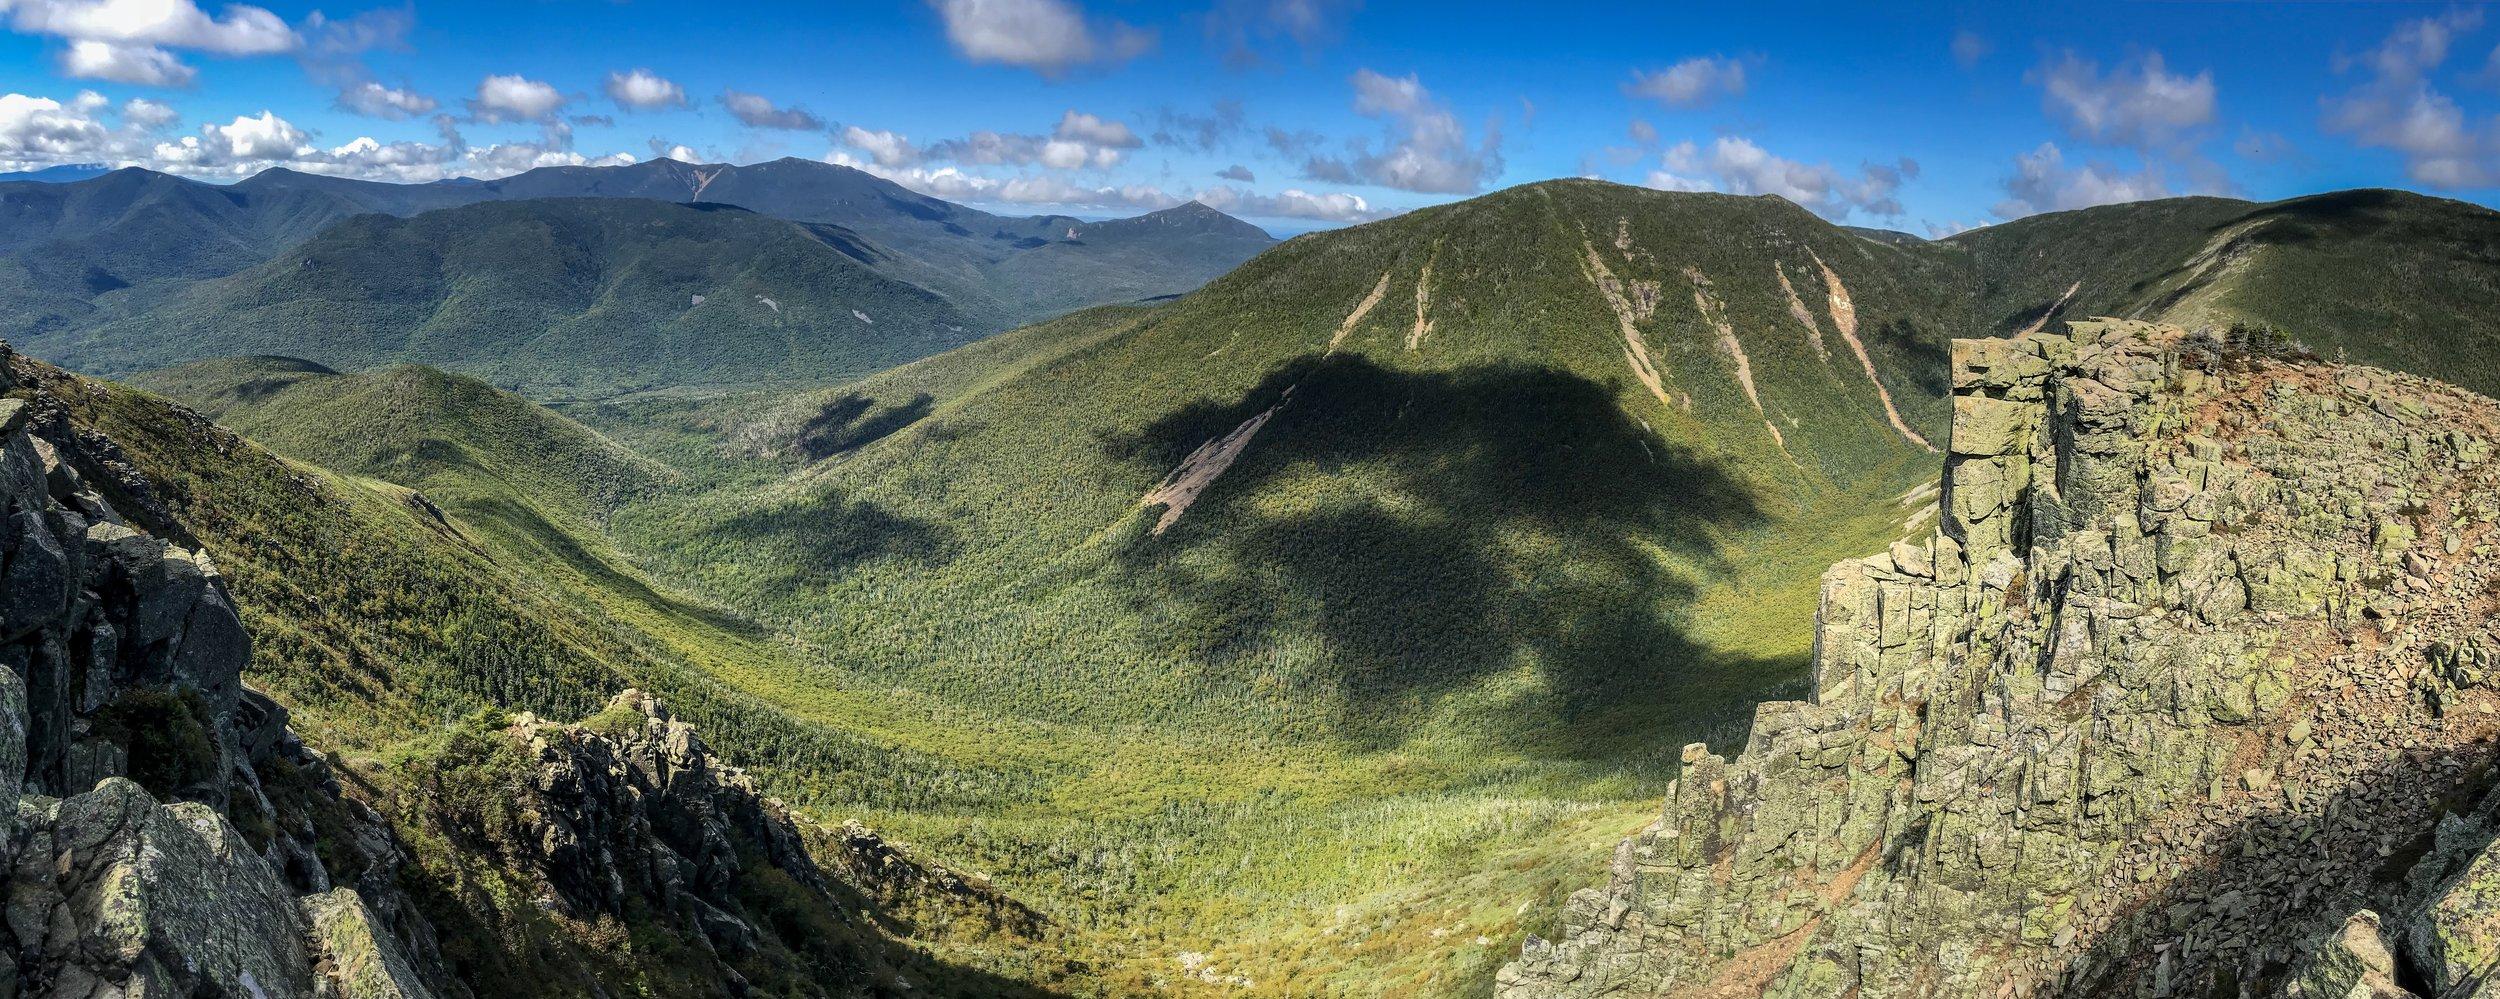 pemi loop run - bond cliff wilderness.jpg